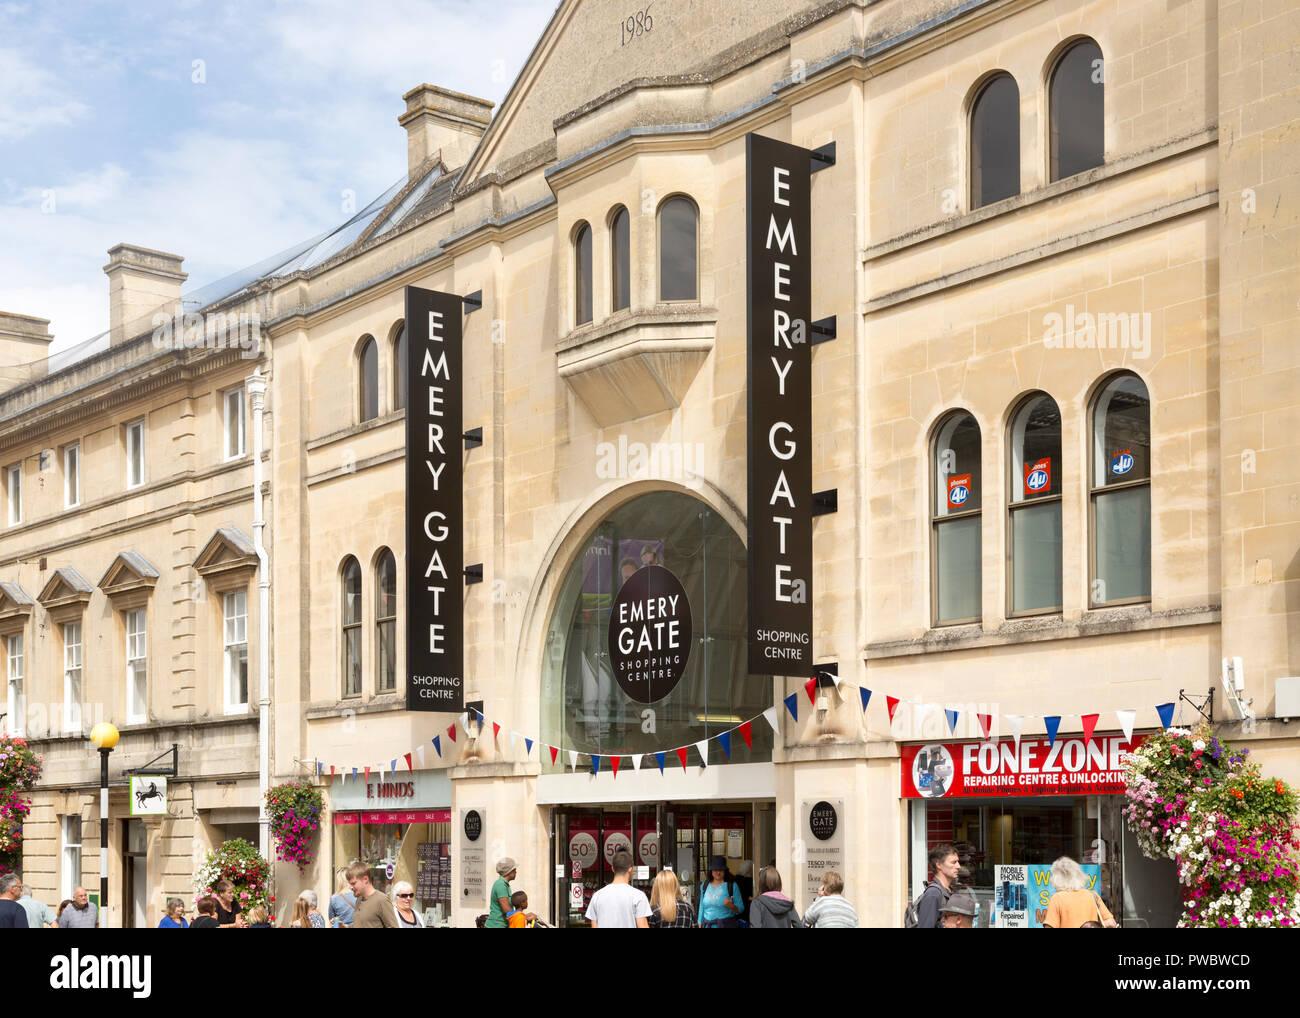 Emery Gate shopping centre, Chippenham, Wiltshire, England, UK - Stock Image